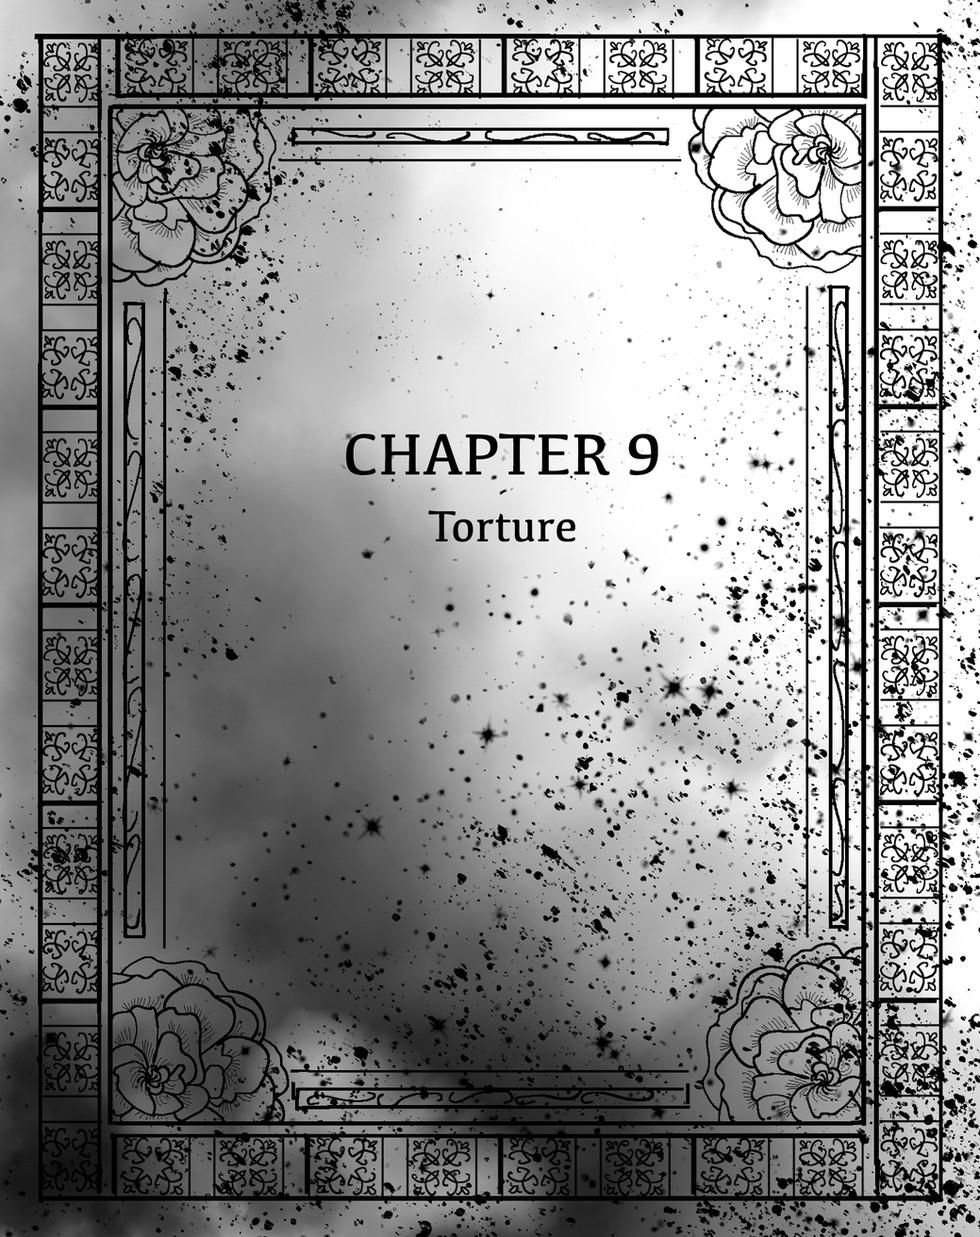 Amnesia_ChapterCard_9.jpg